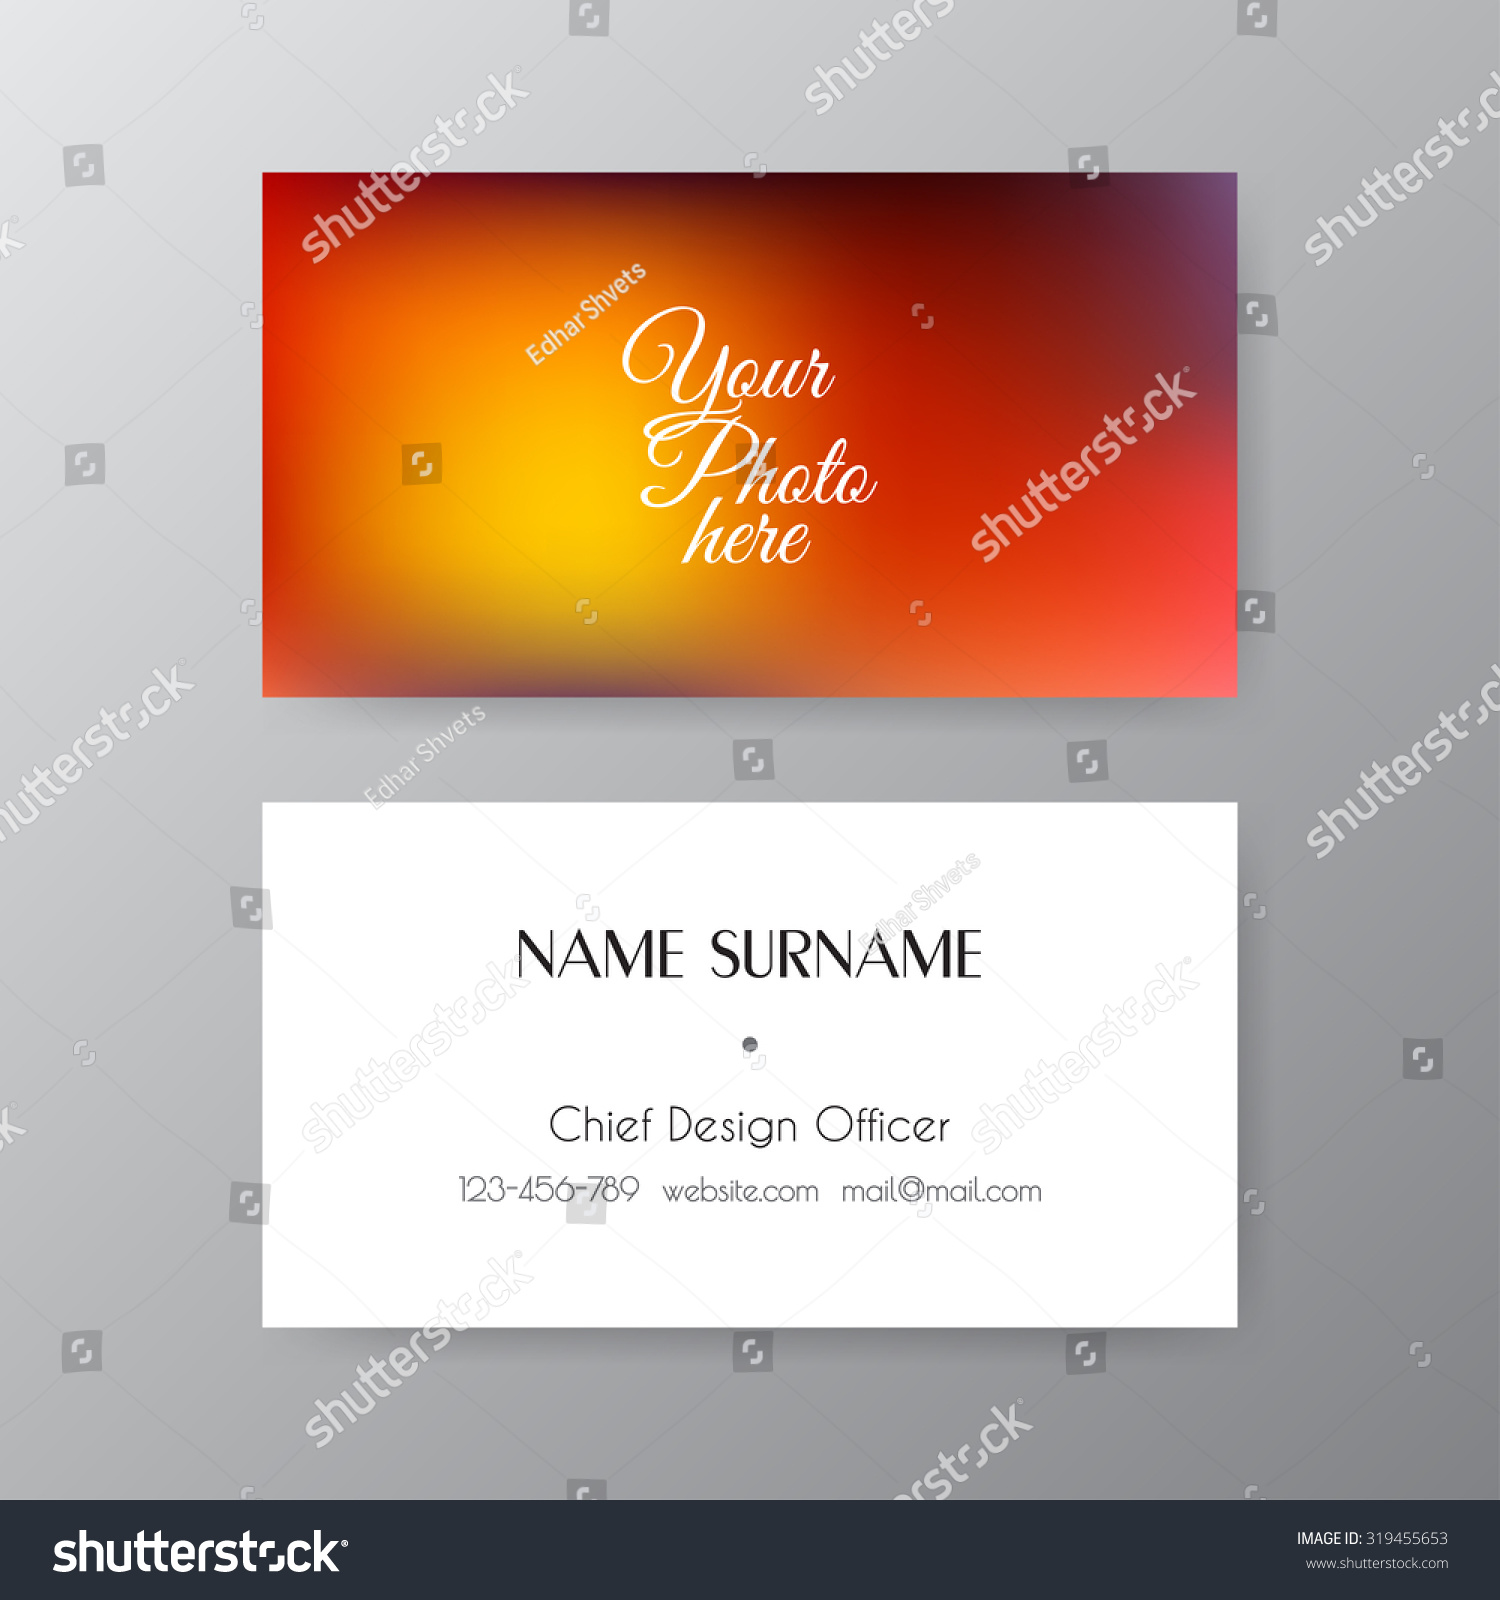 Editable Business Card Set 85 X Stock Vector 319455653 - Shutterstock